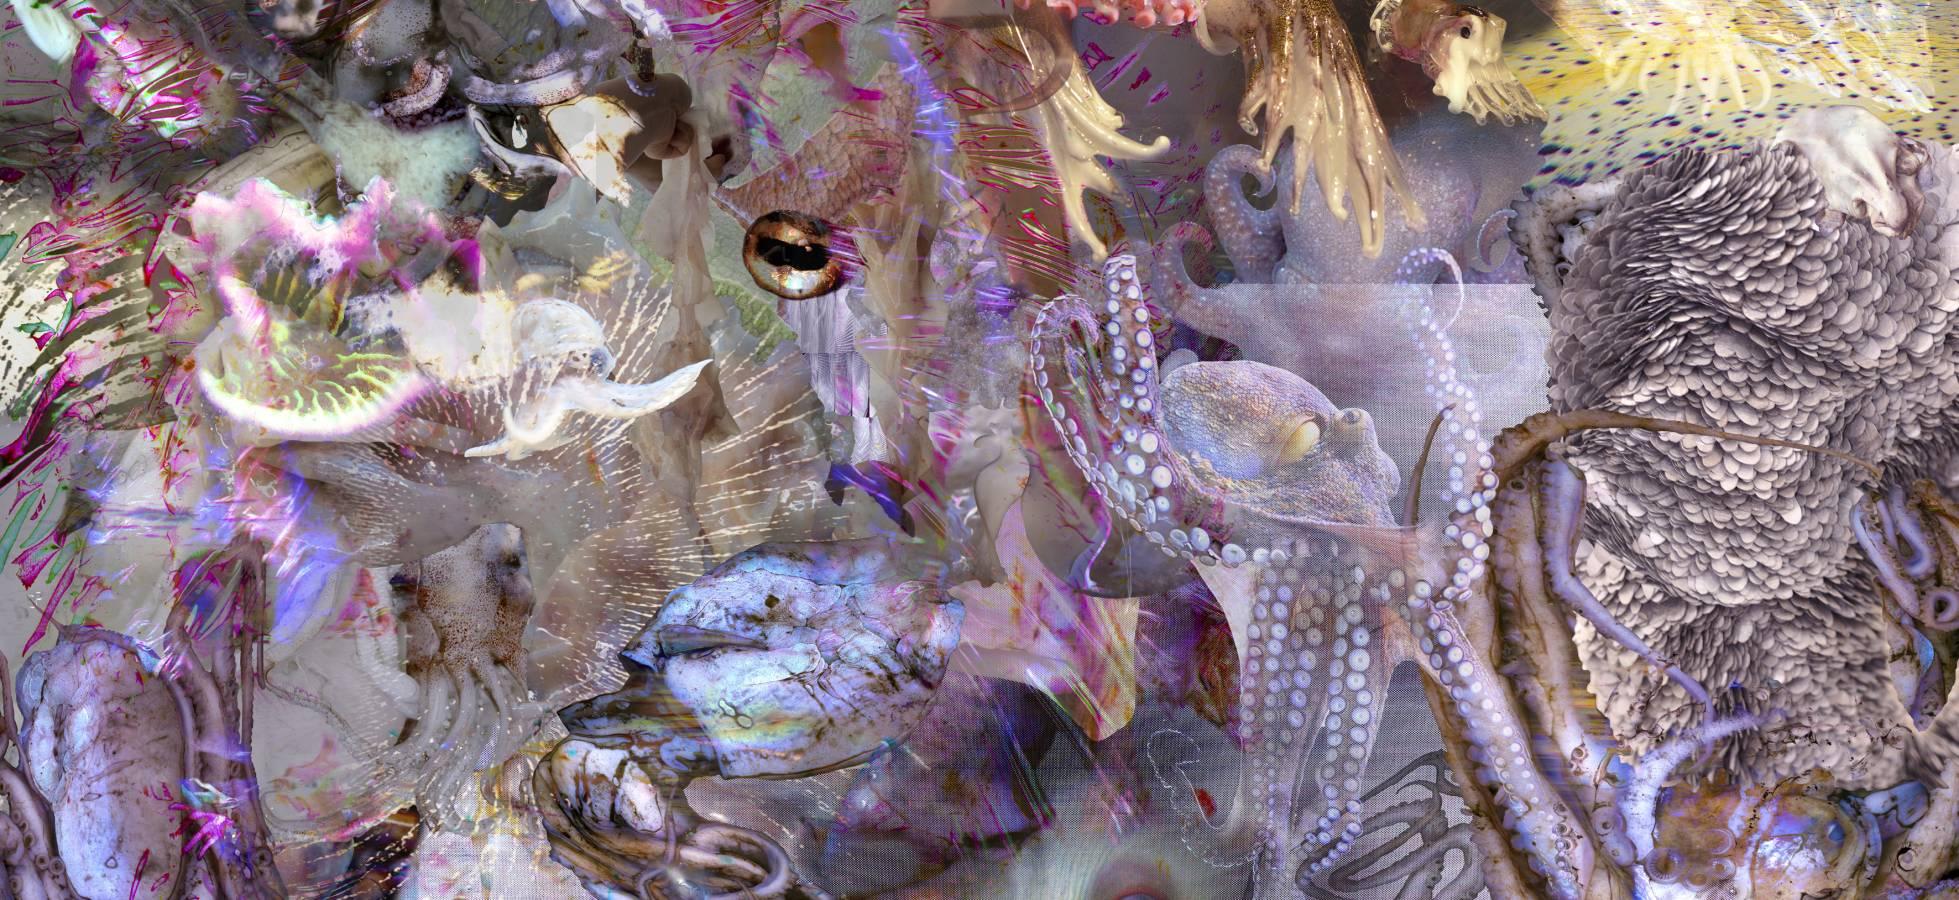 Maggie Roberts Uncanny Valley. Aspex Gallery